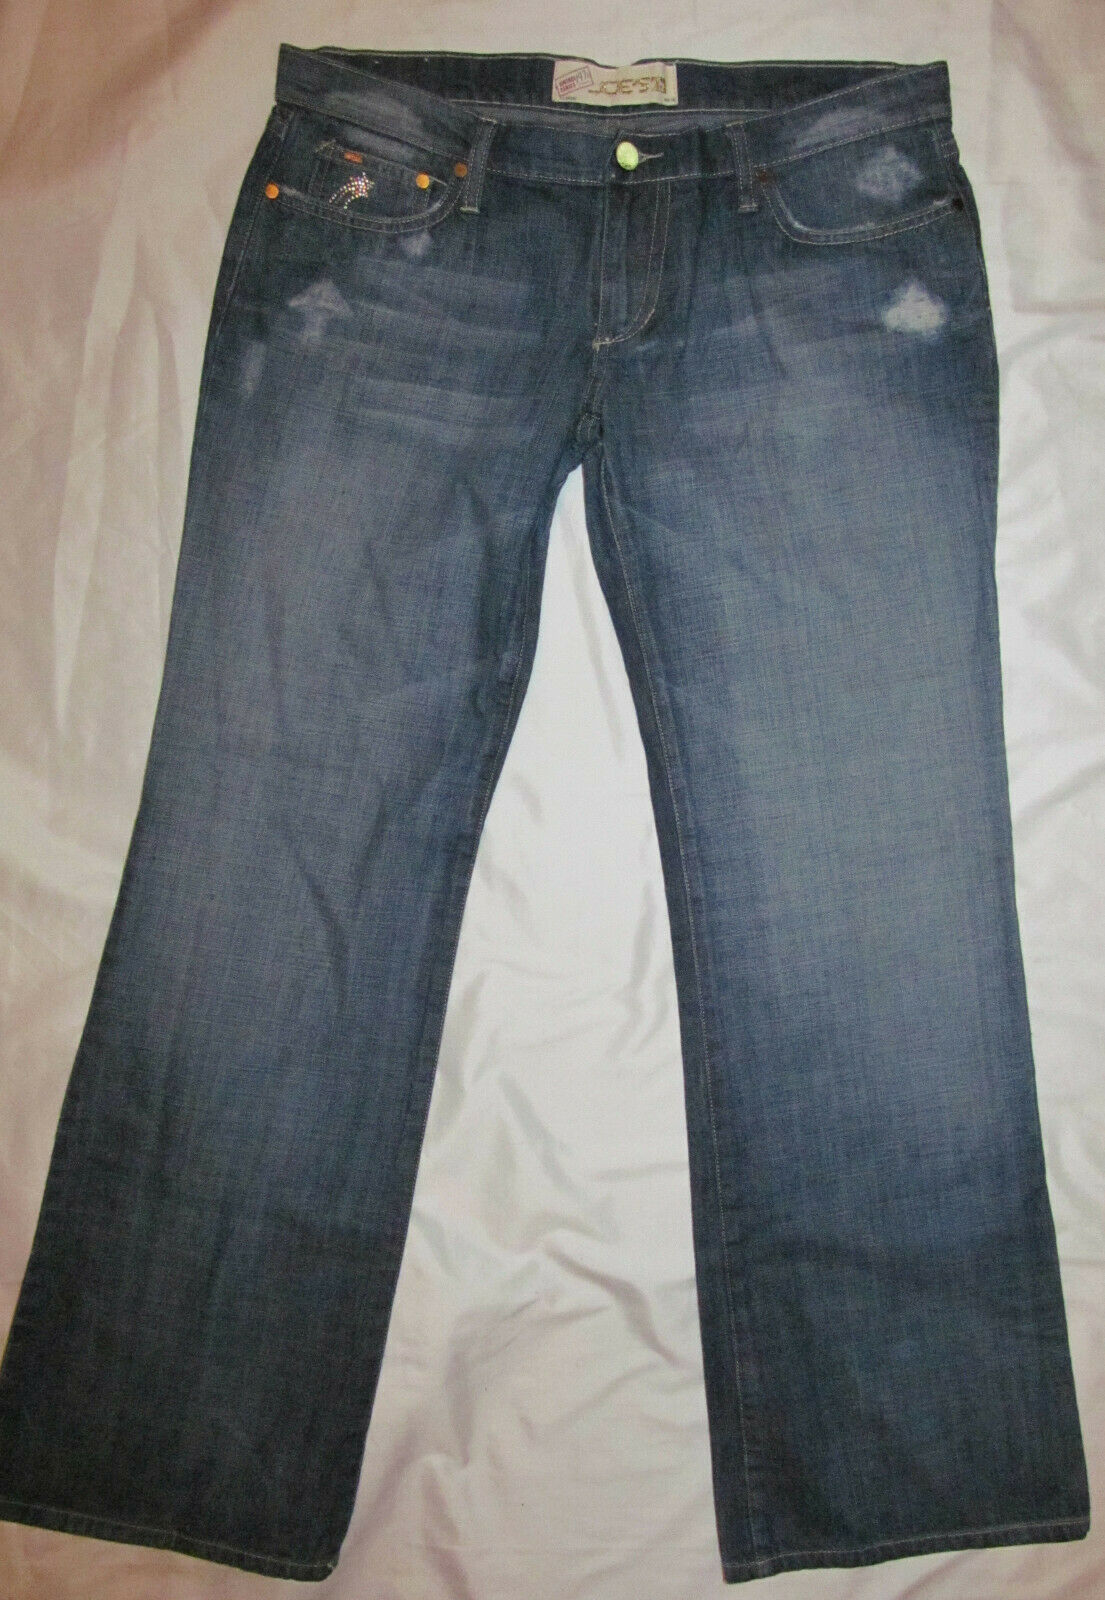 JOE'S  SOCIALITE VINTAGE SERIES 1971 HEART rhinestone star stars jeans 31 NWT